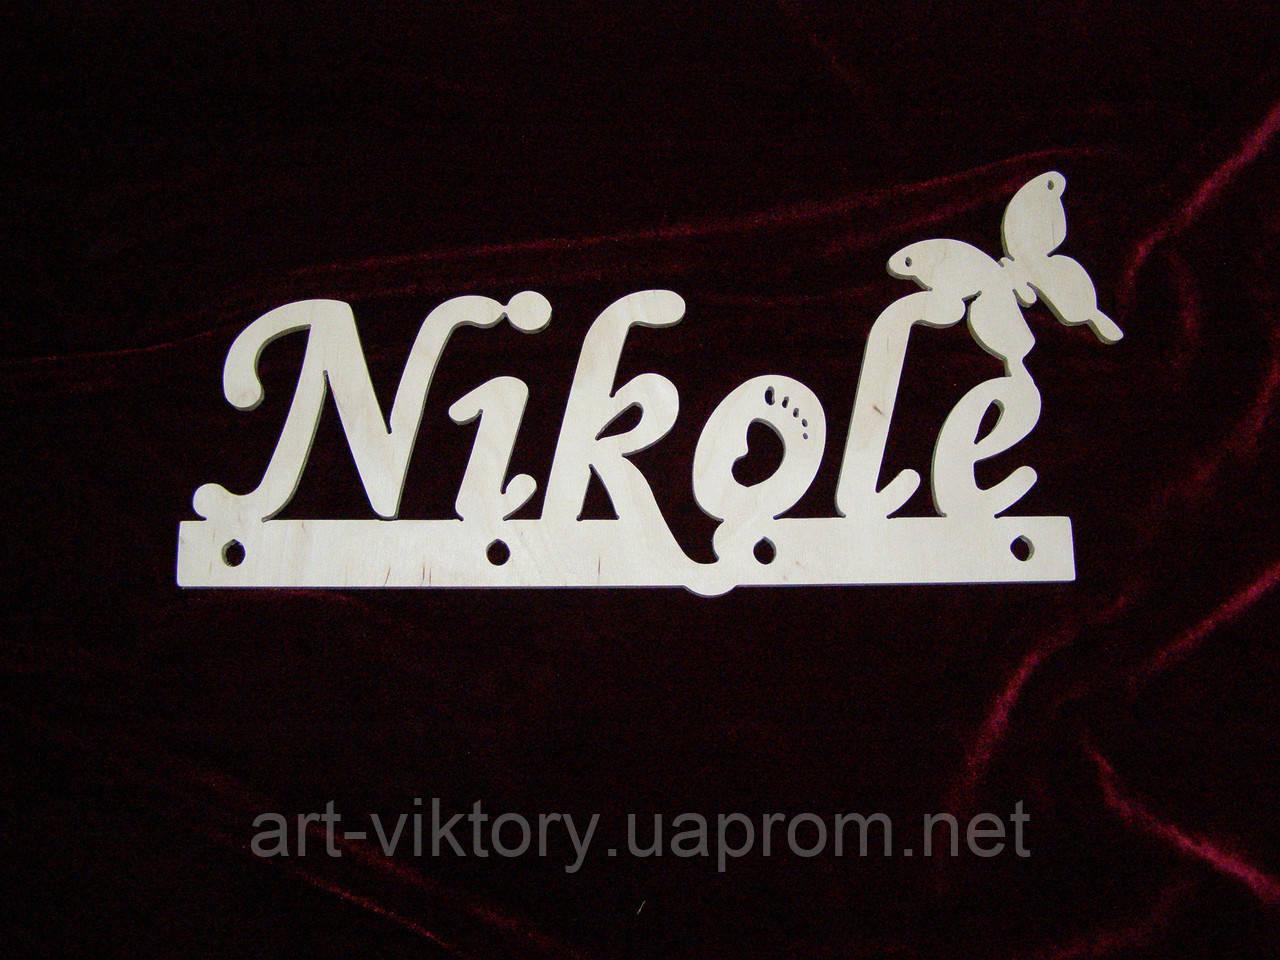 Имя Nikole